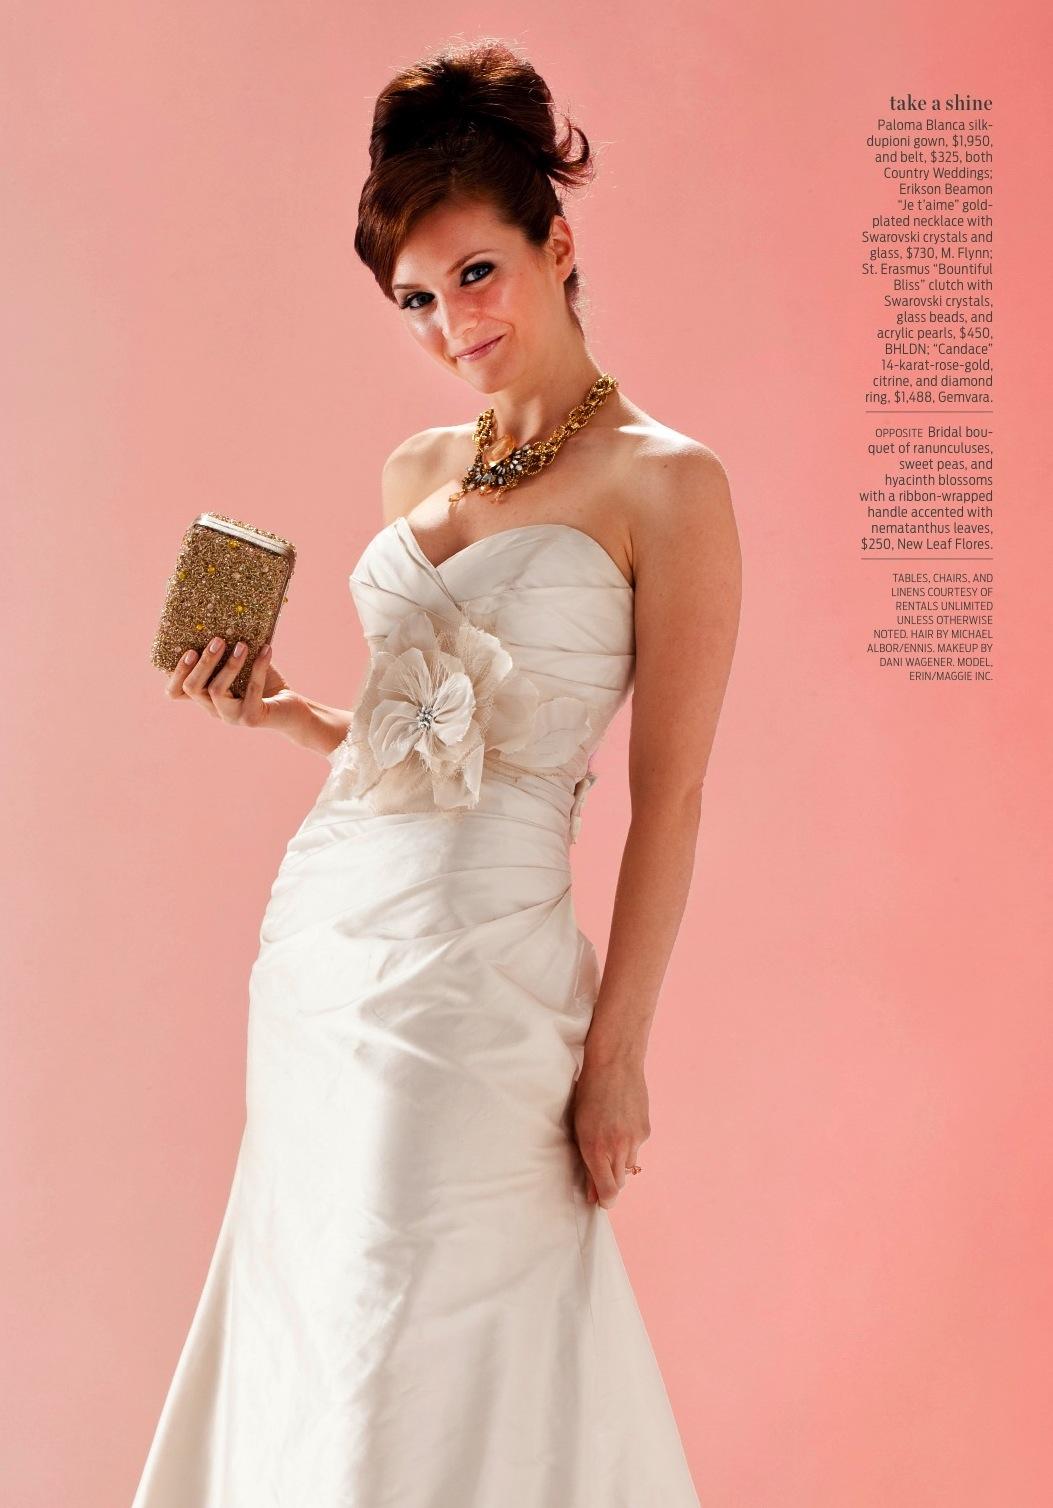 Asombroso Paula Yates Wedding Dress Friso - Colección de Vestidos de ...